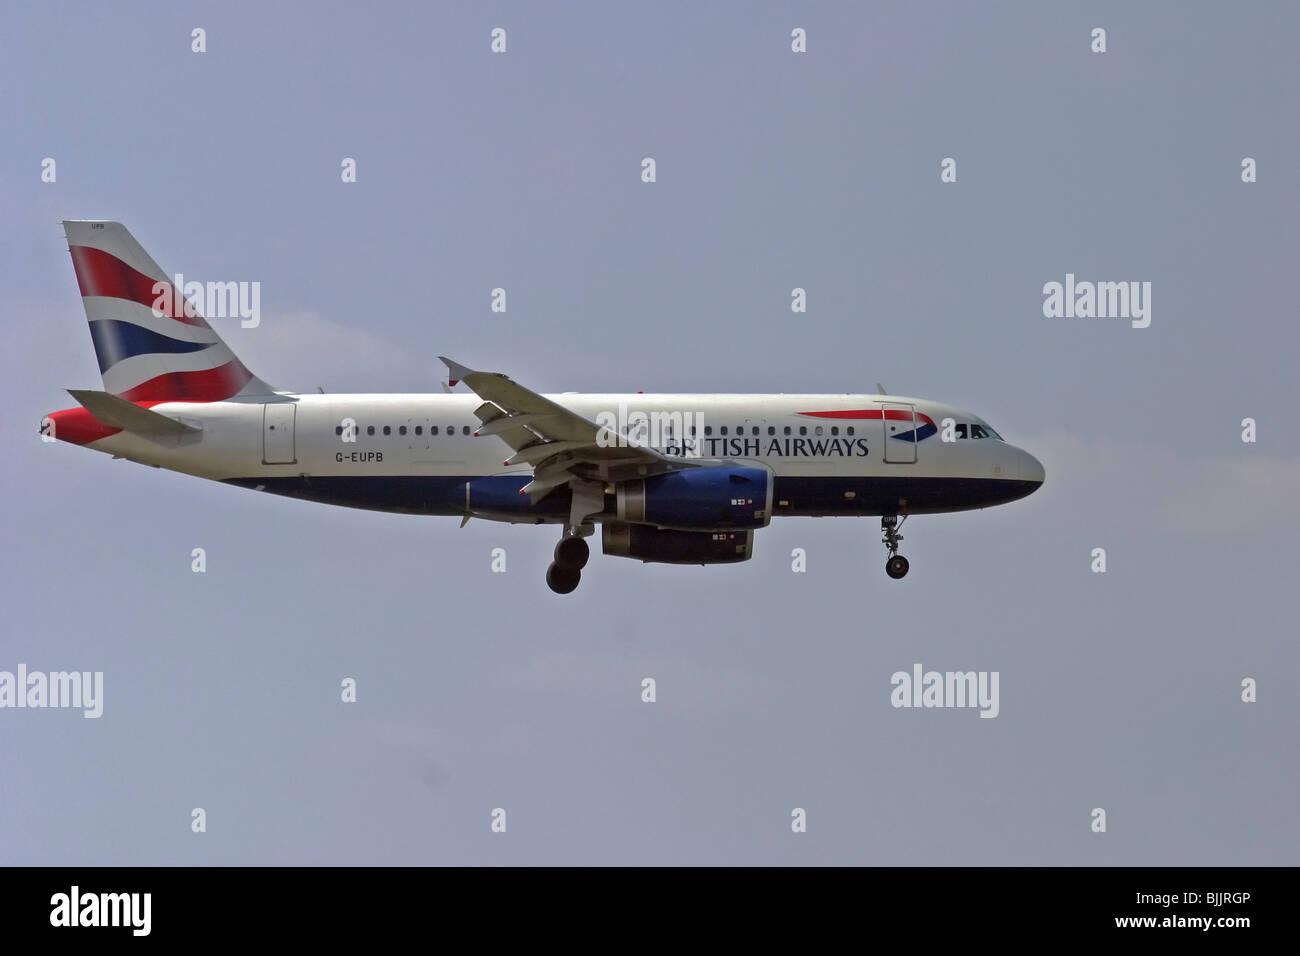 Italy, Milan, Linate Airport, British Airways passenger jet - Stock Image